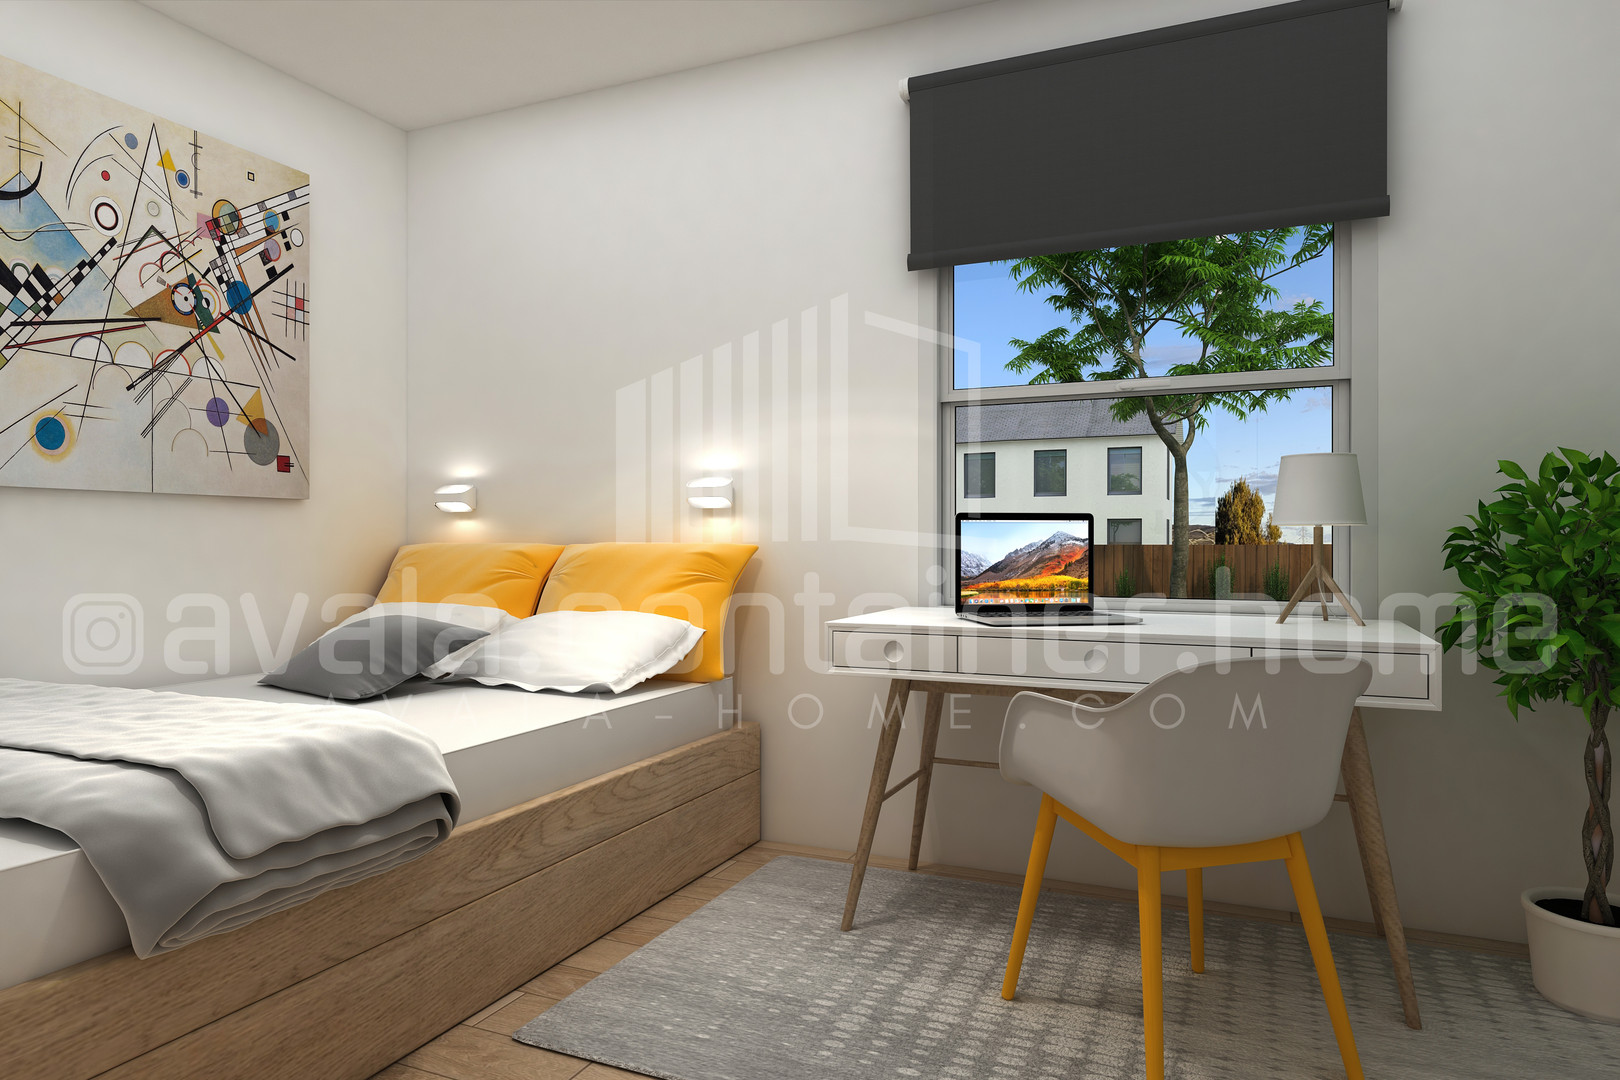 G240_Bedroom 1_final_28-10-2020.jpg